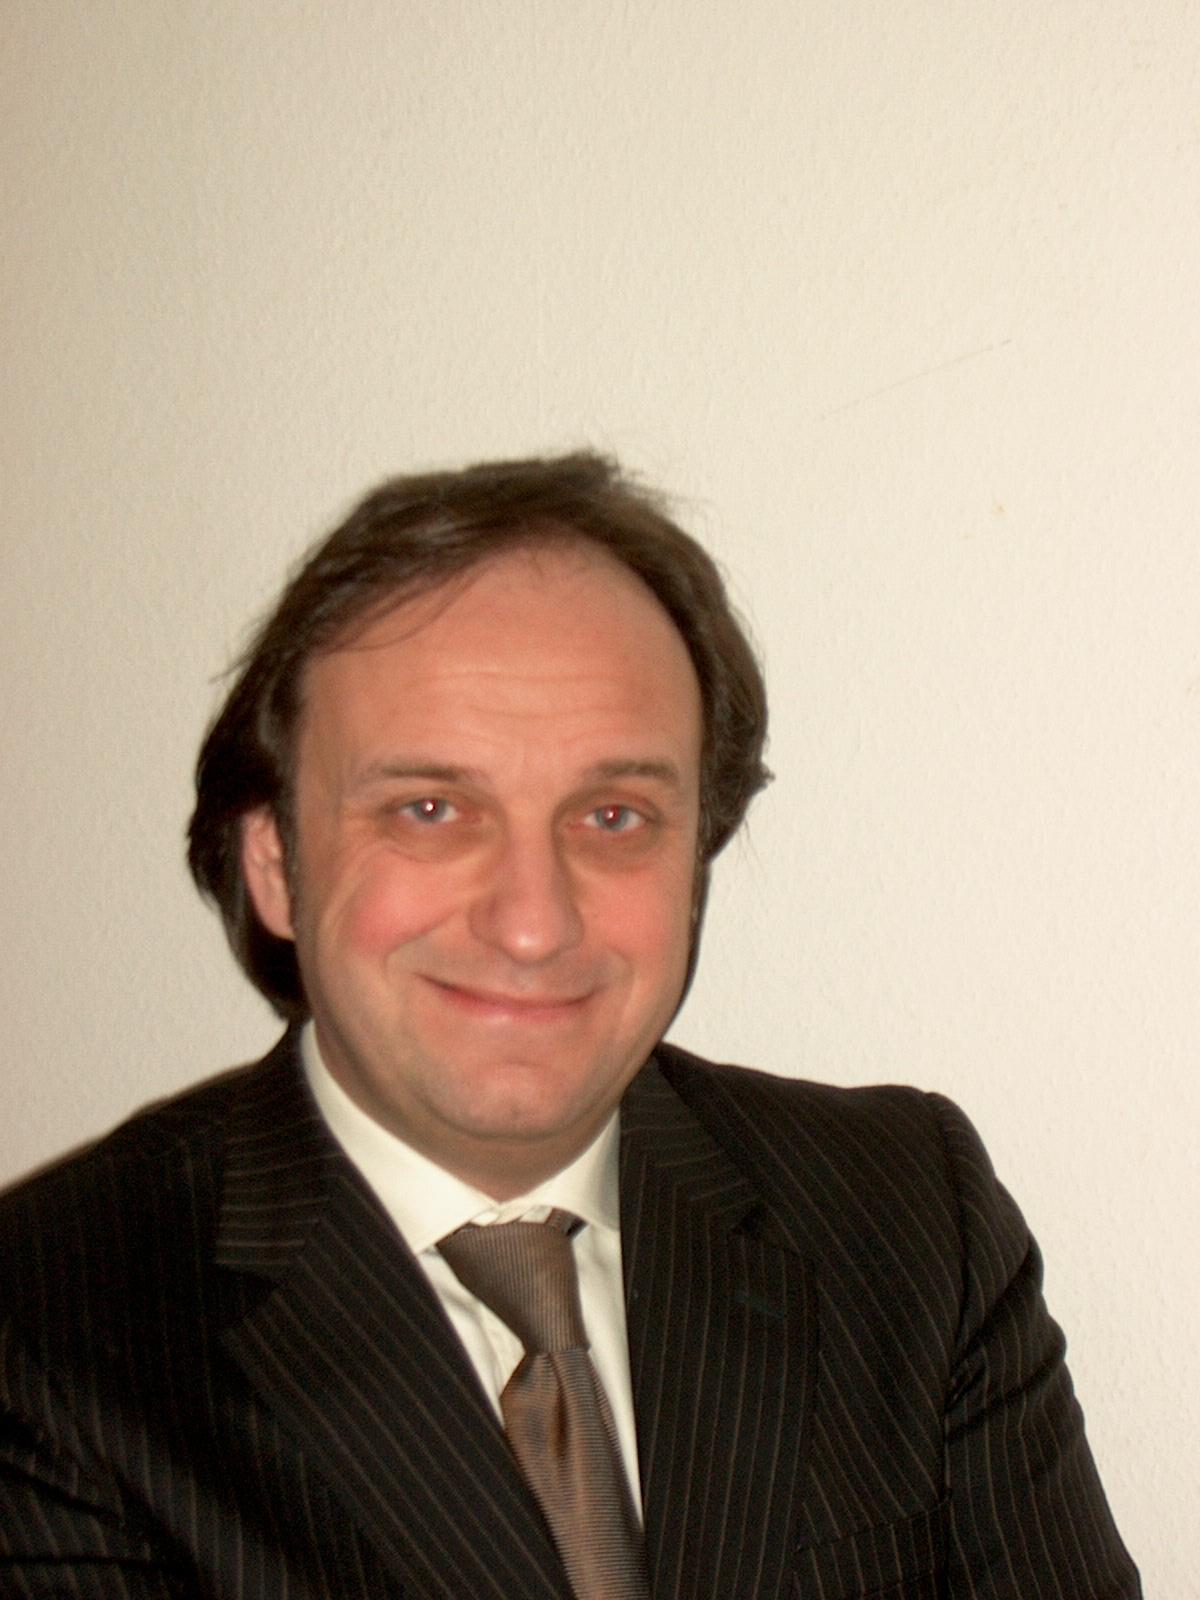 Publiciteitsfotos2006.jpg